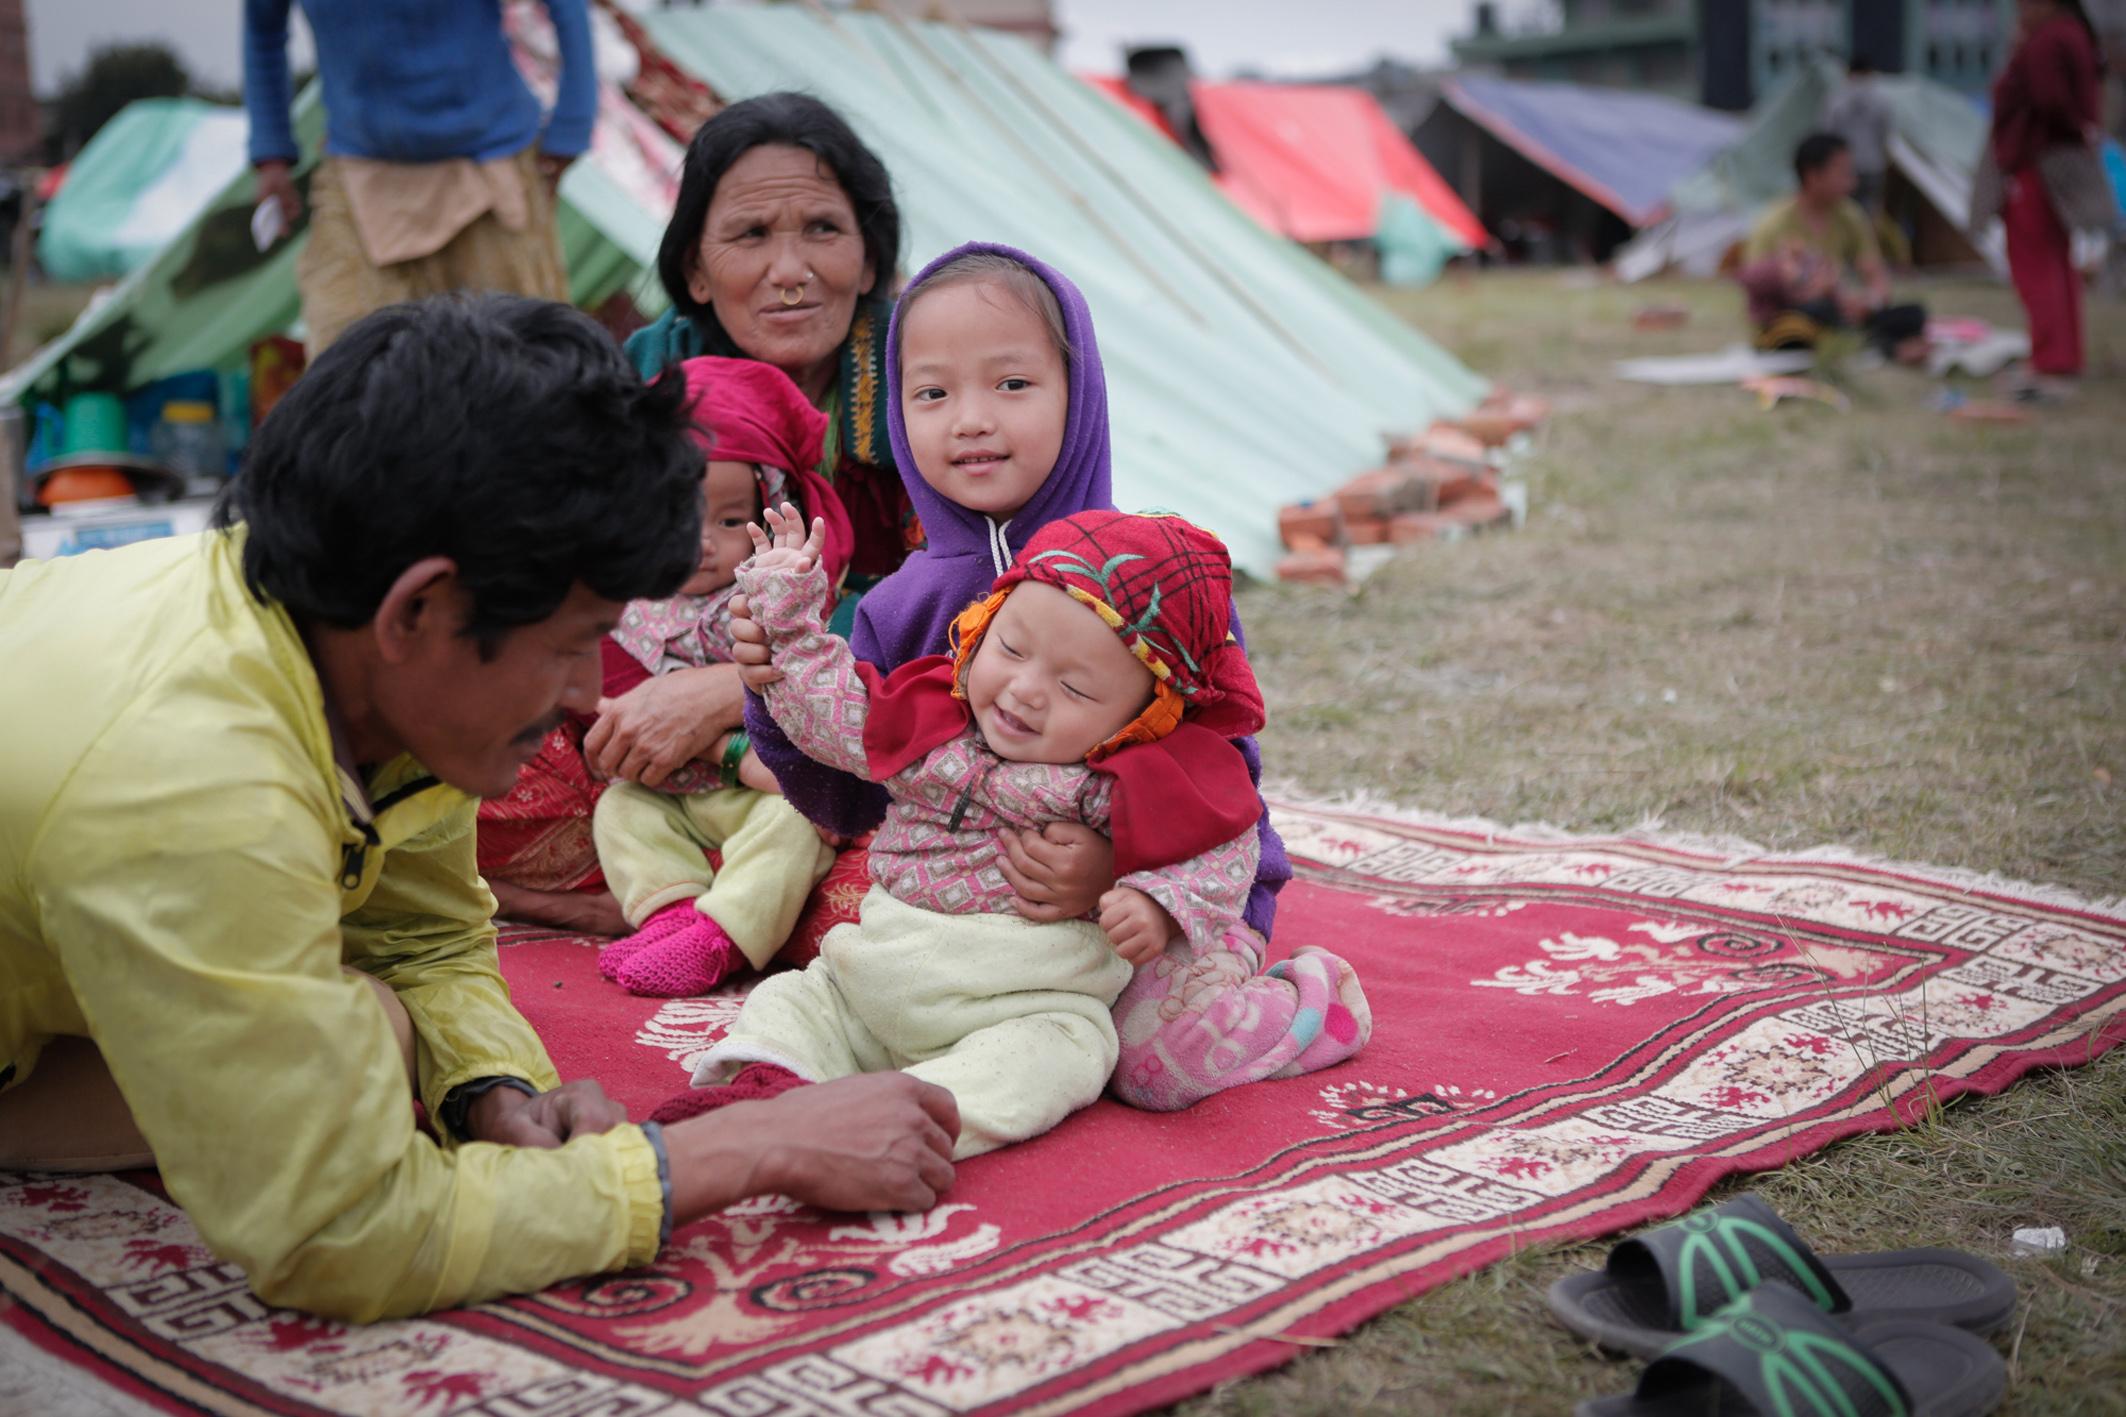 Pressefoto SOS Kinderdorf Nepal Zishaan Akbar Latif